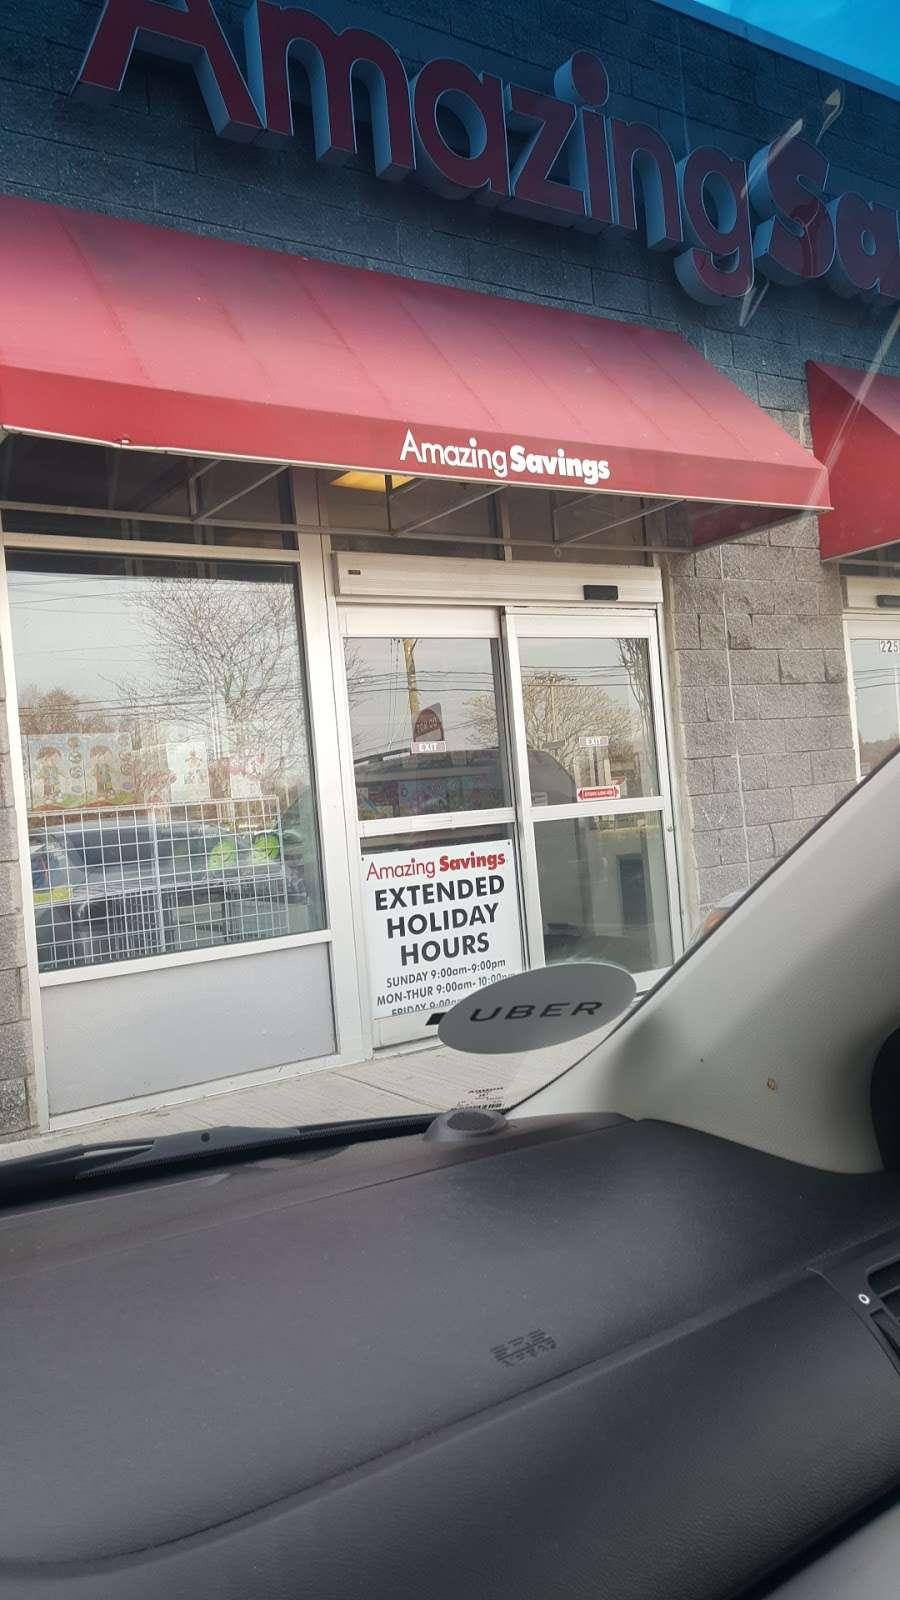 Amazing Savings Clifton - store  | Photo 7 of 10 | Address: 1803, 225 Allwood Rd, Clifton, NJ 07012, USA | Phone: (973) 778-7070